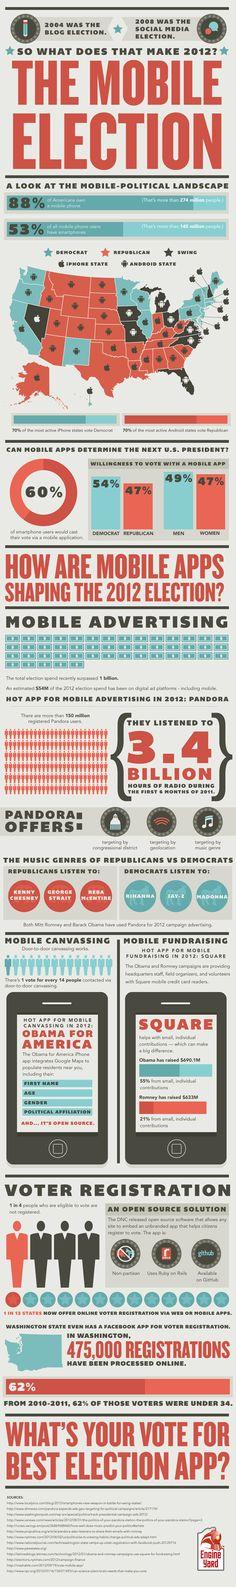 THE MOBILE ELECTION http://mashable.com/2012/10/09/mobile-election-2012-infographic/ Marketing Sociologist @phoenixrichard